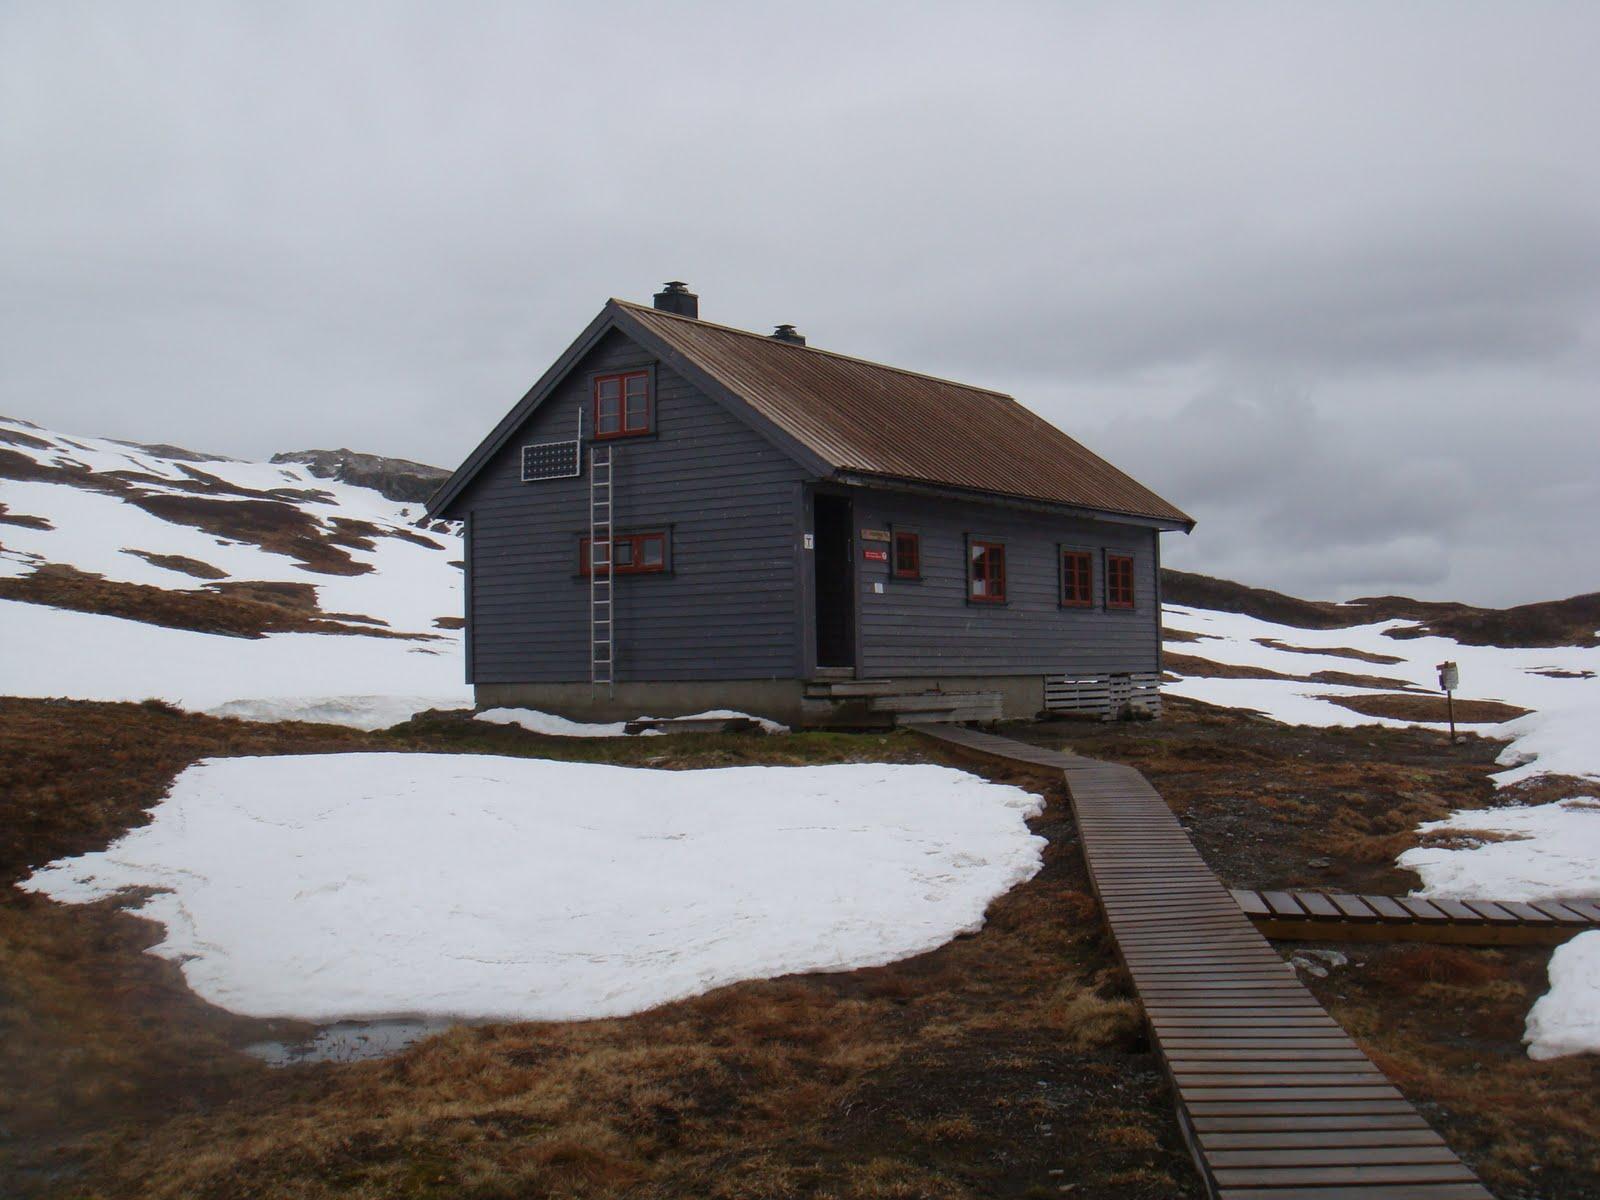 stefie in norwegen bergtour nach vending. Black Bedroom Furniture Sets. Home Design Ideas